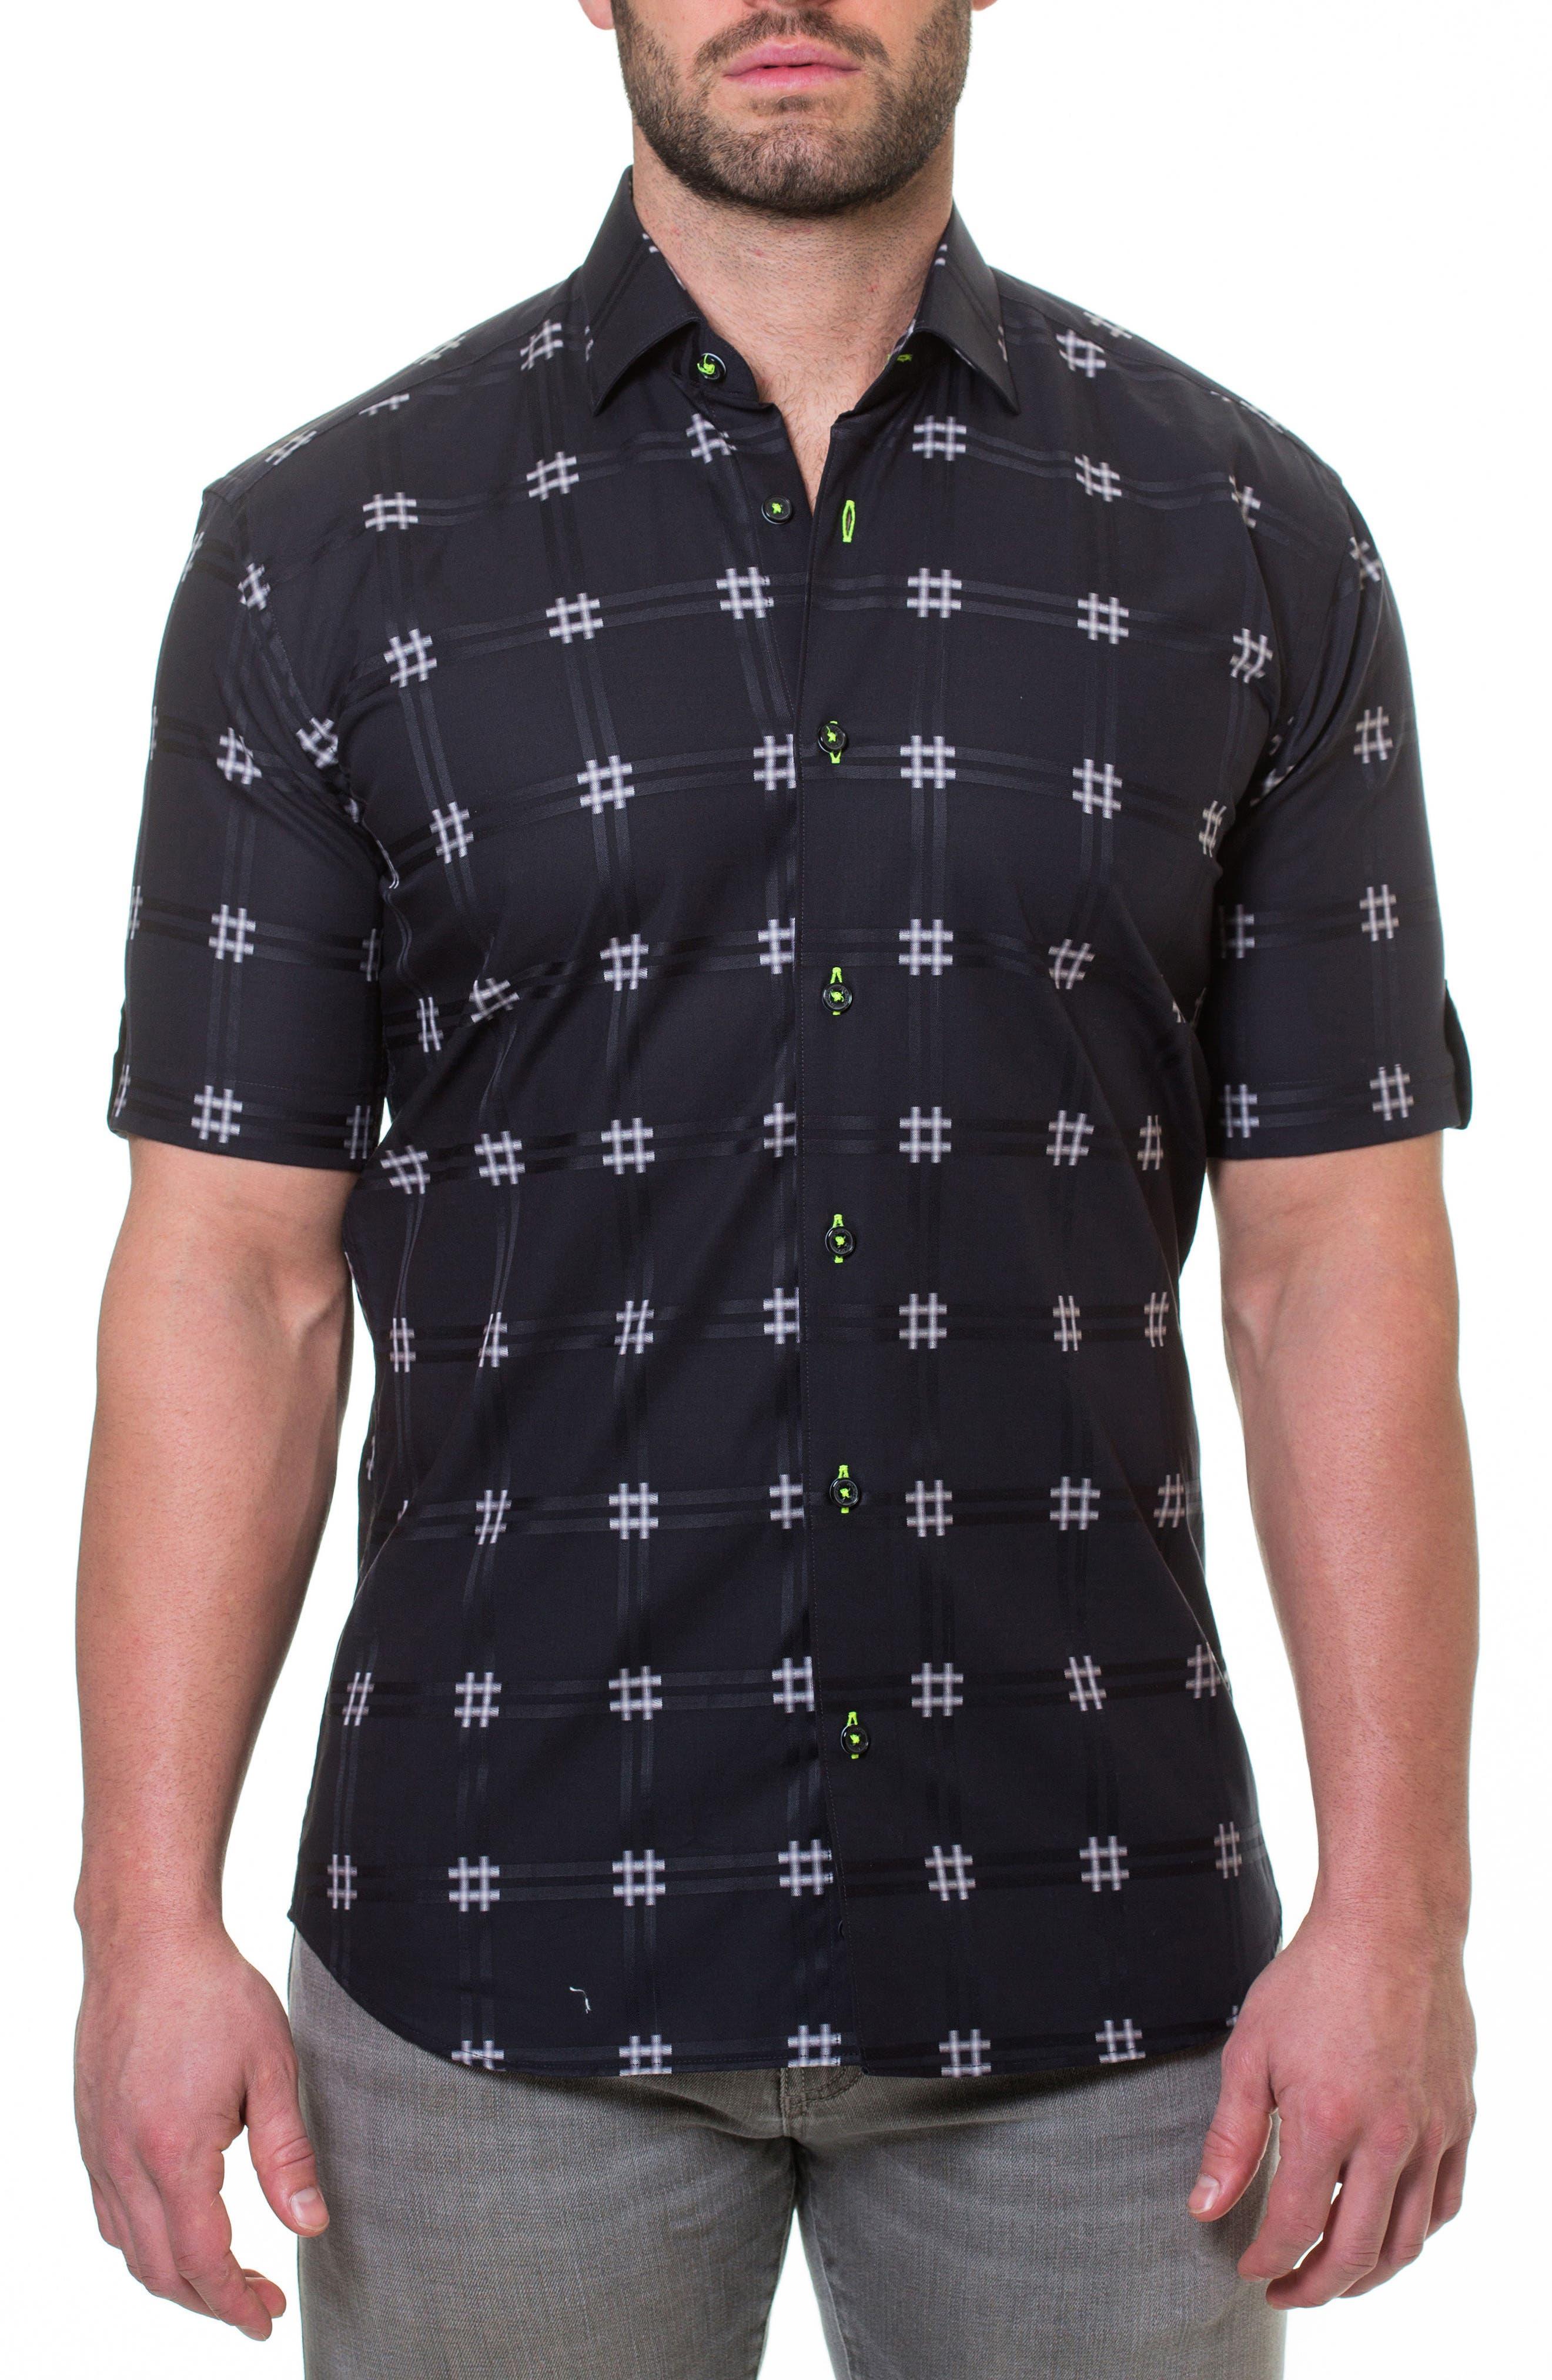 Maceoo Fresh Pound Slim Fit Sport Shirt